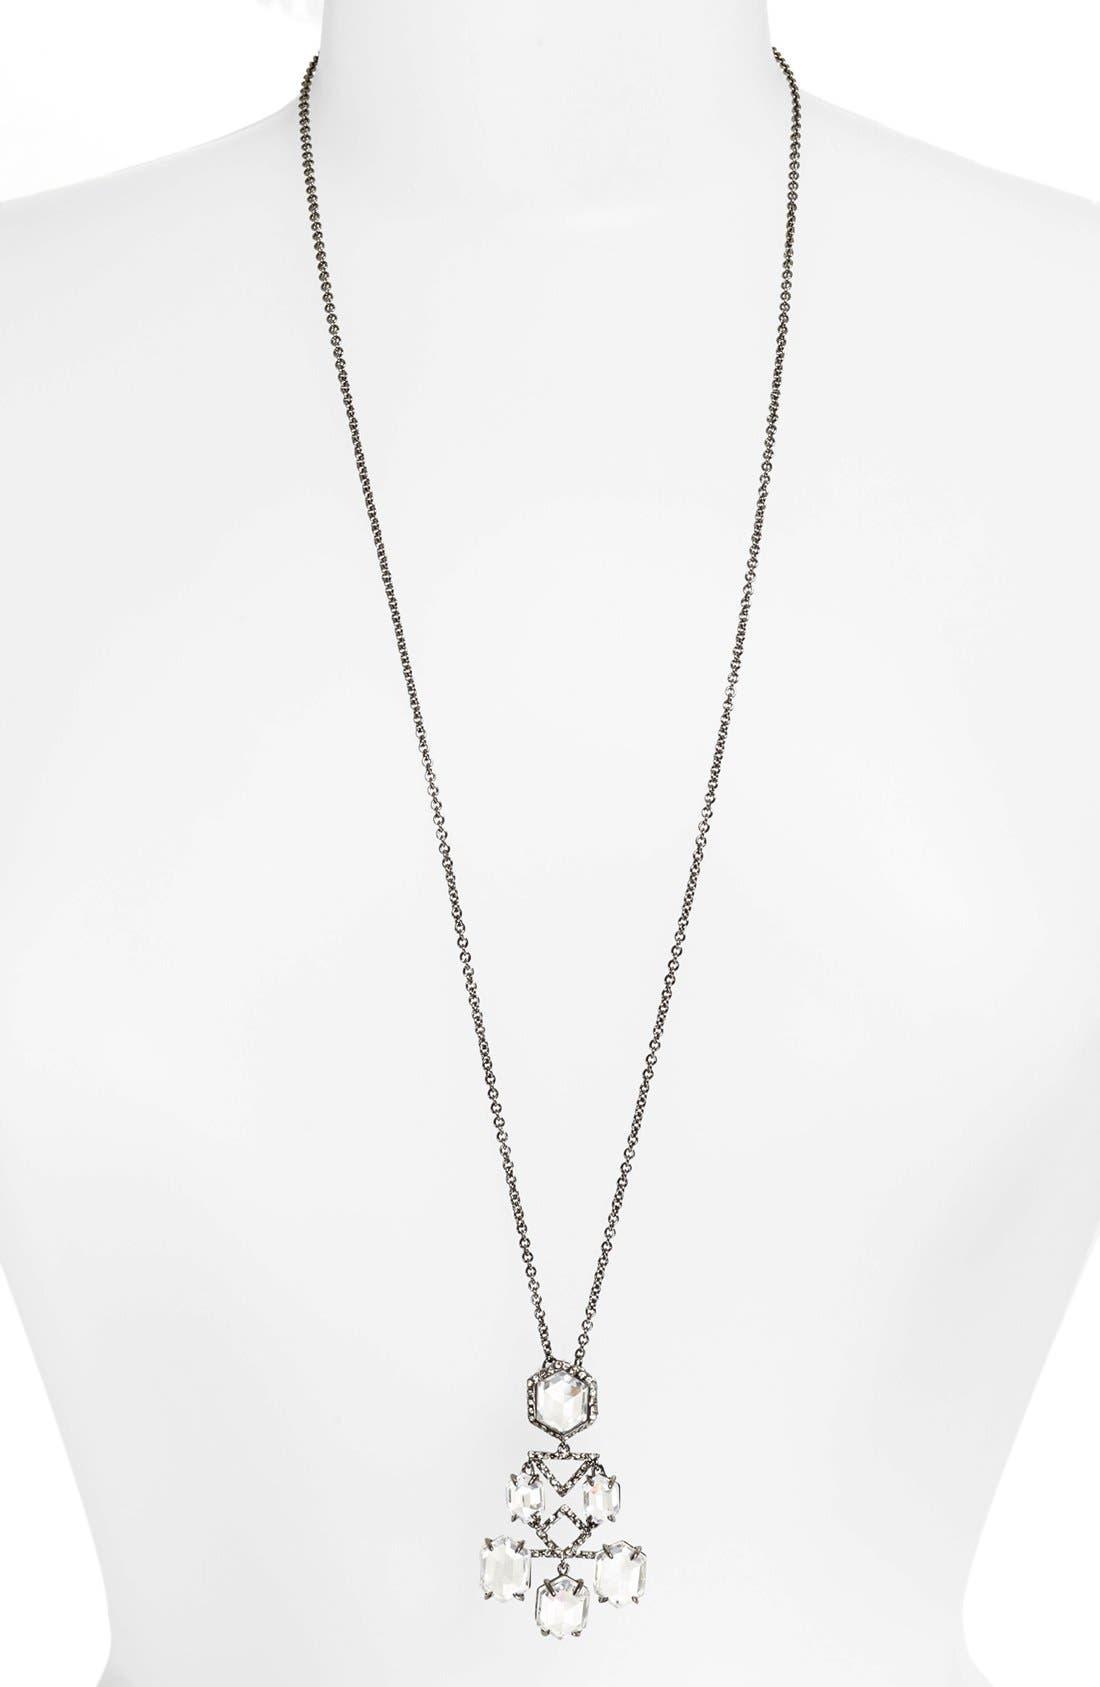 Main Image - Alexis Bittar 'Miss Havisham - Pavo' Long Pendant Necklace